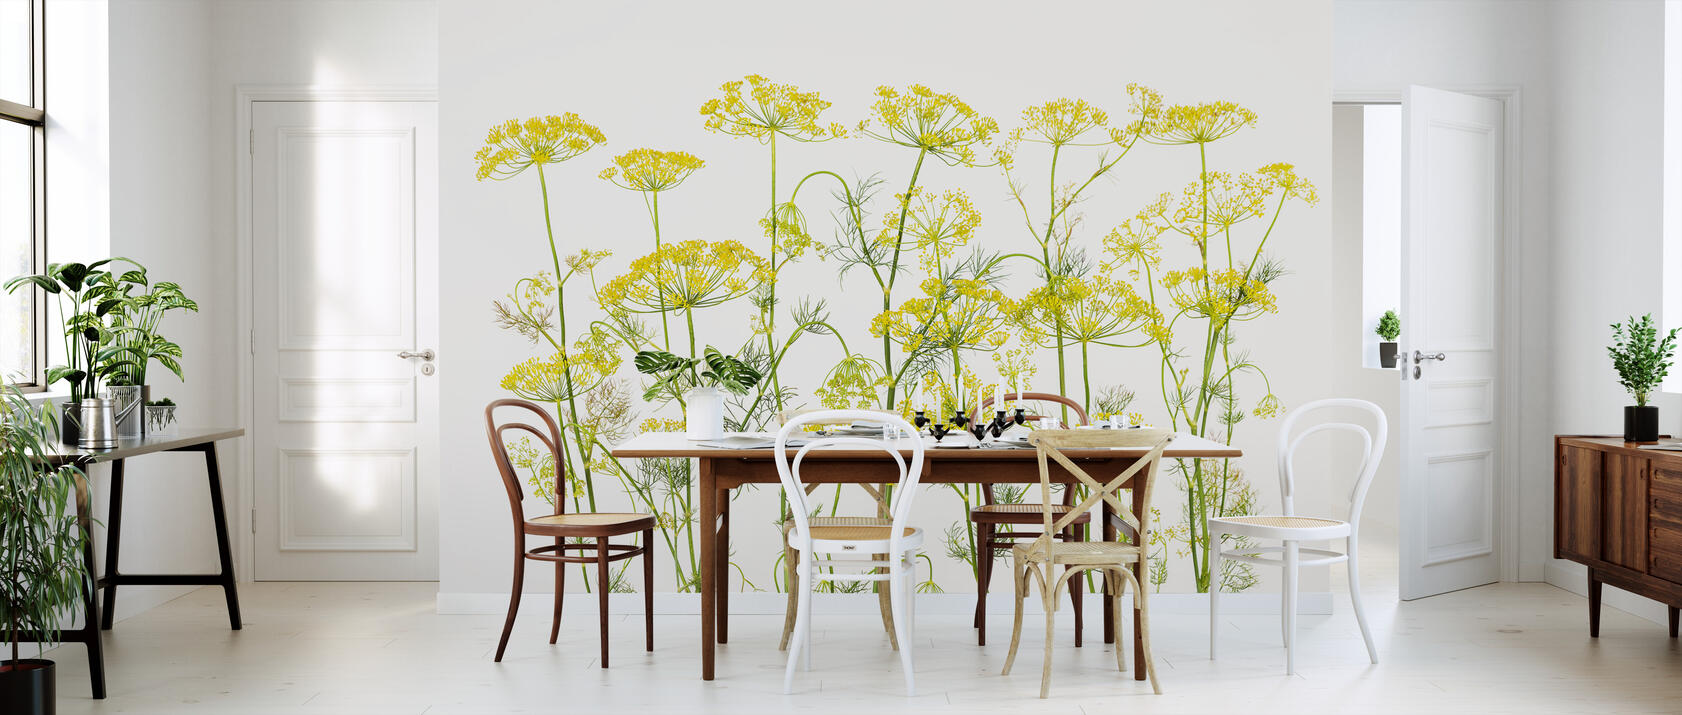 dill herb preiswerte fototapete photowall. Black Bedroom Furniture Sets. Home Design Ideas